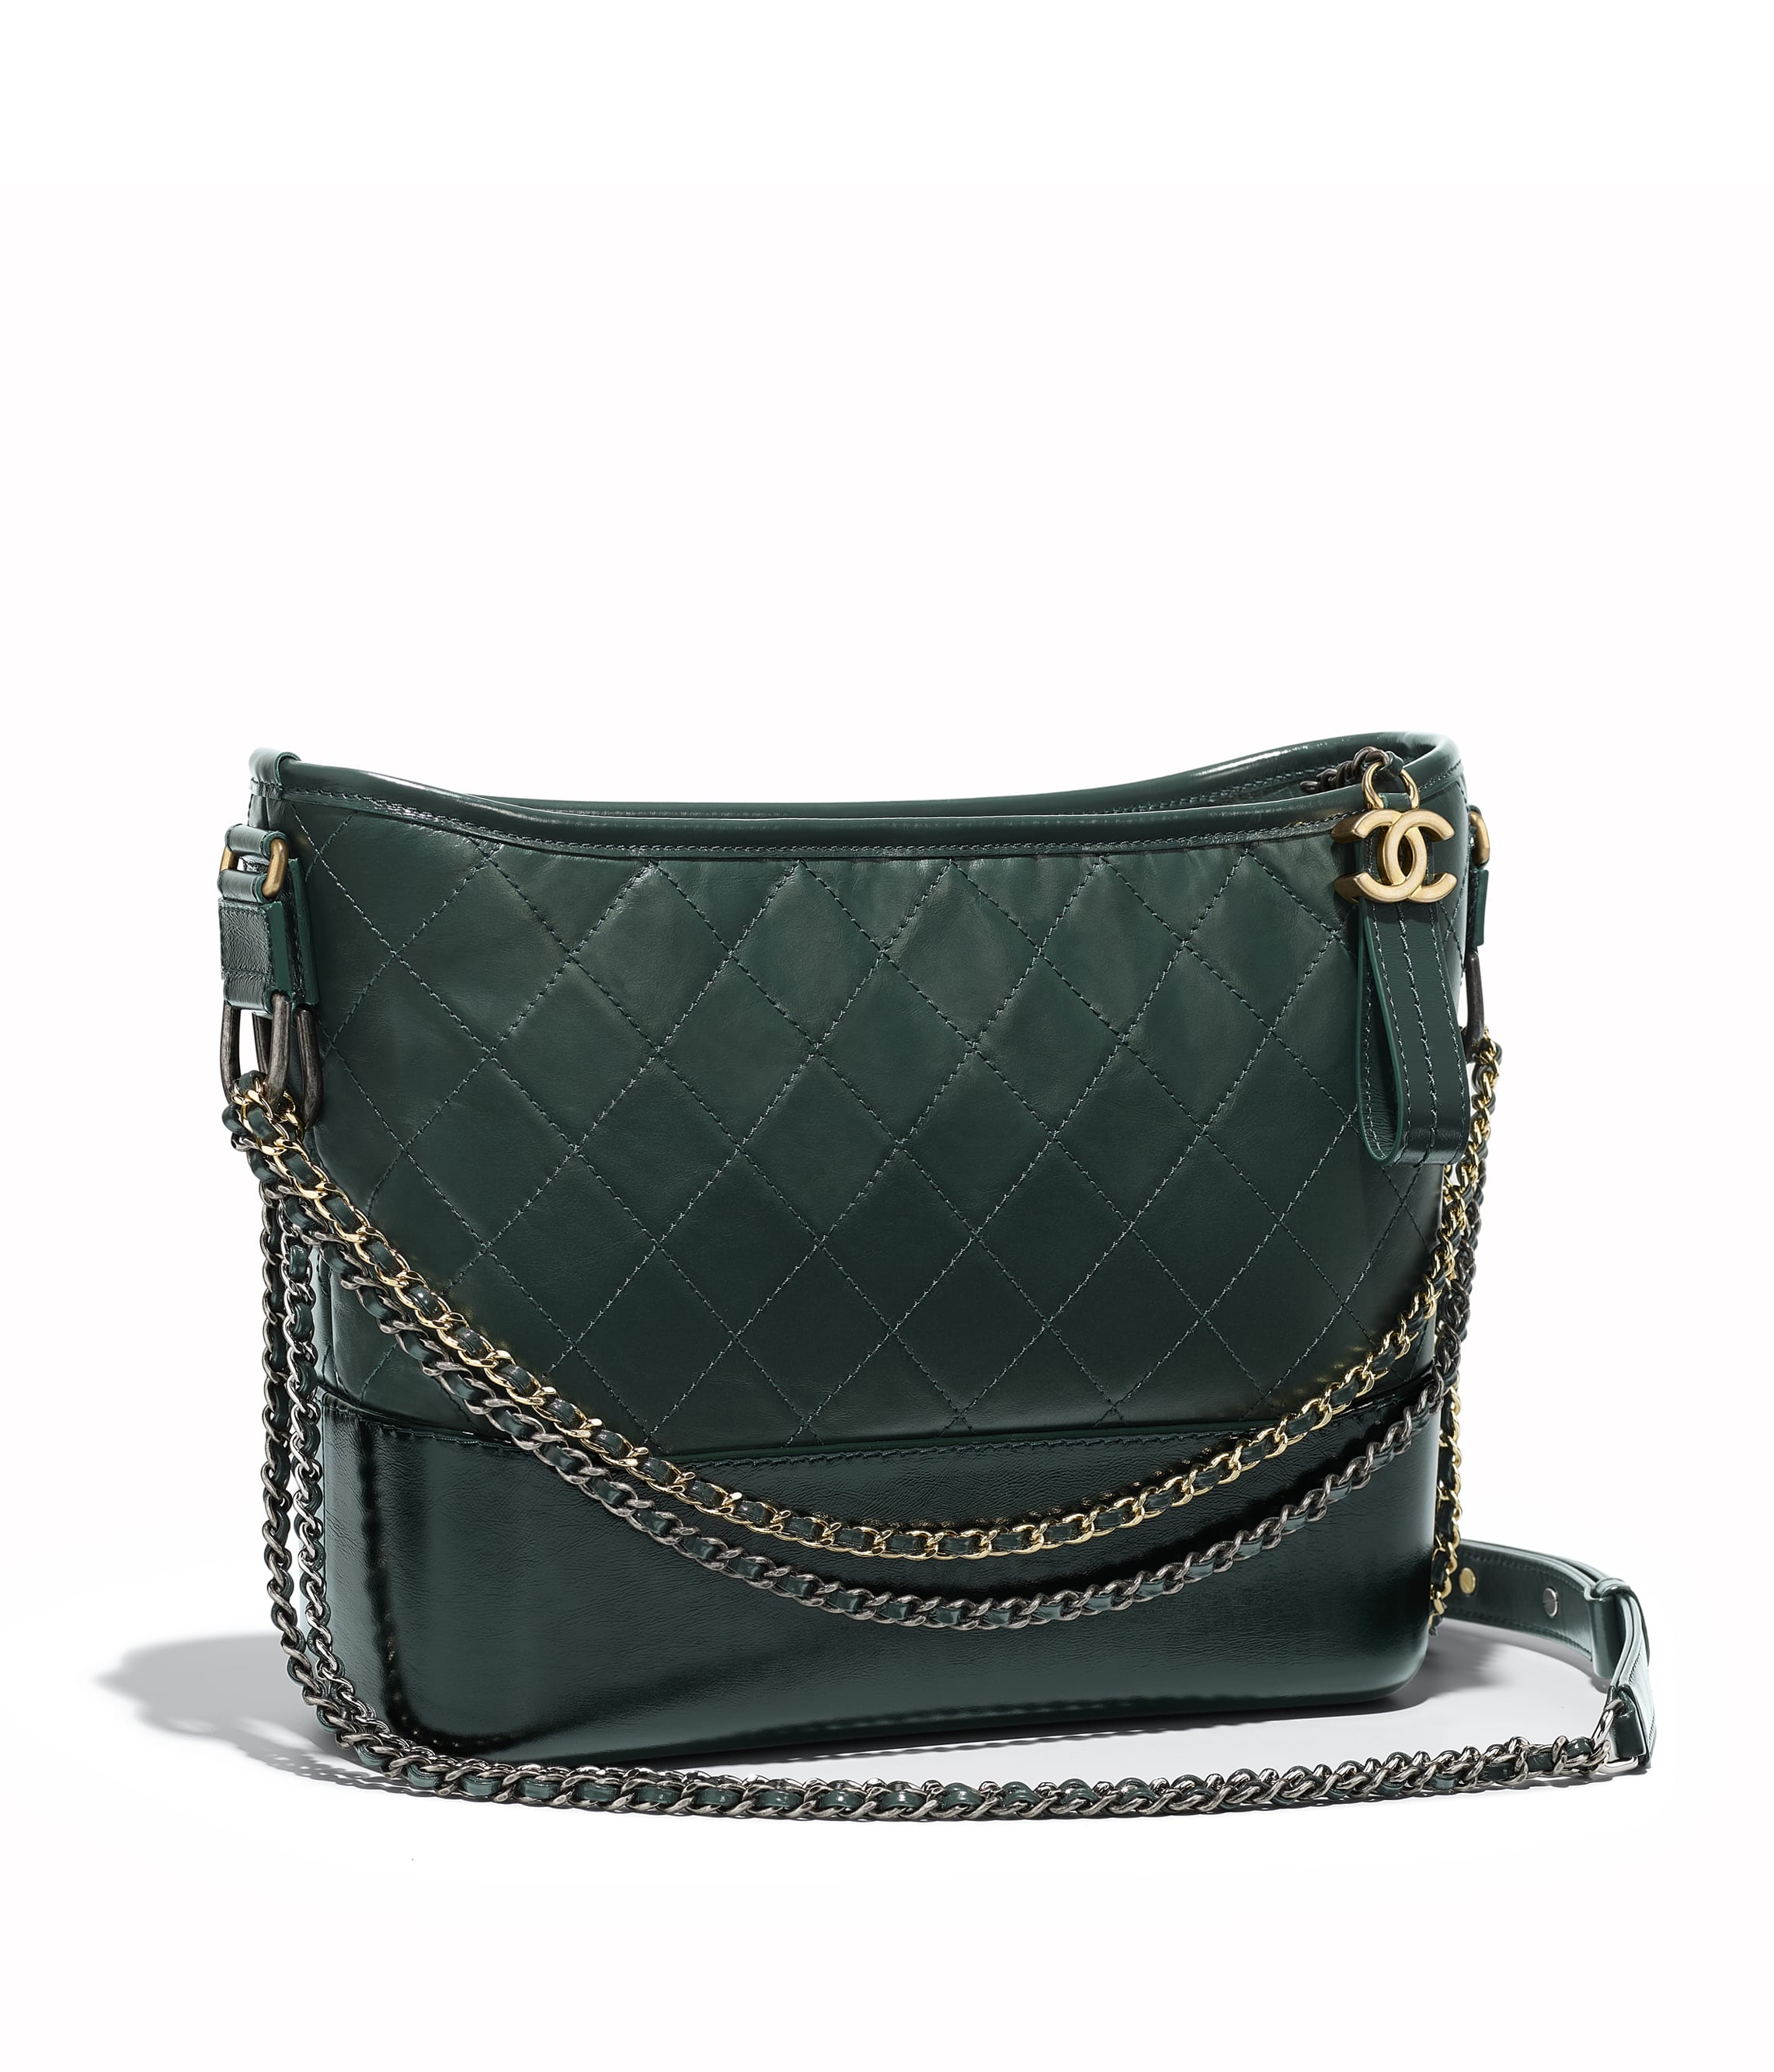 Chanel S Gabrielle Hobo Bag